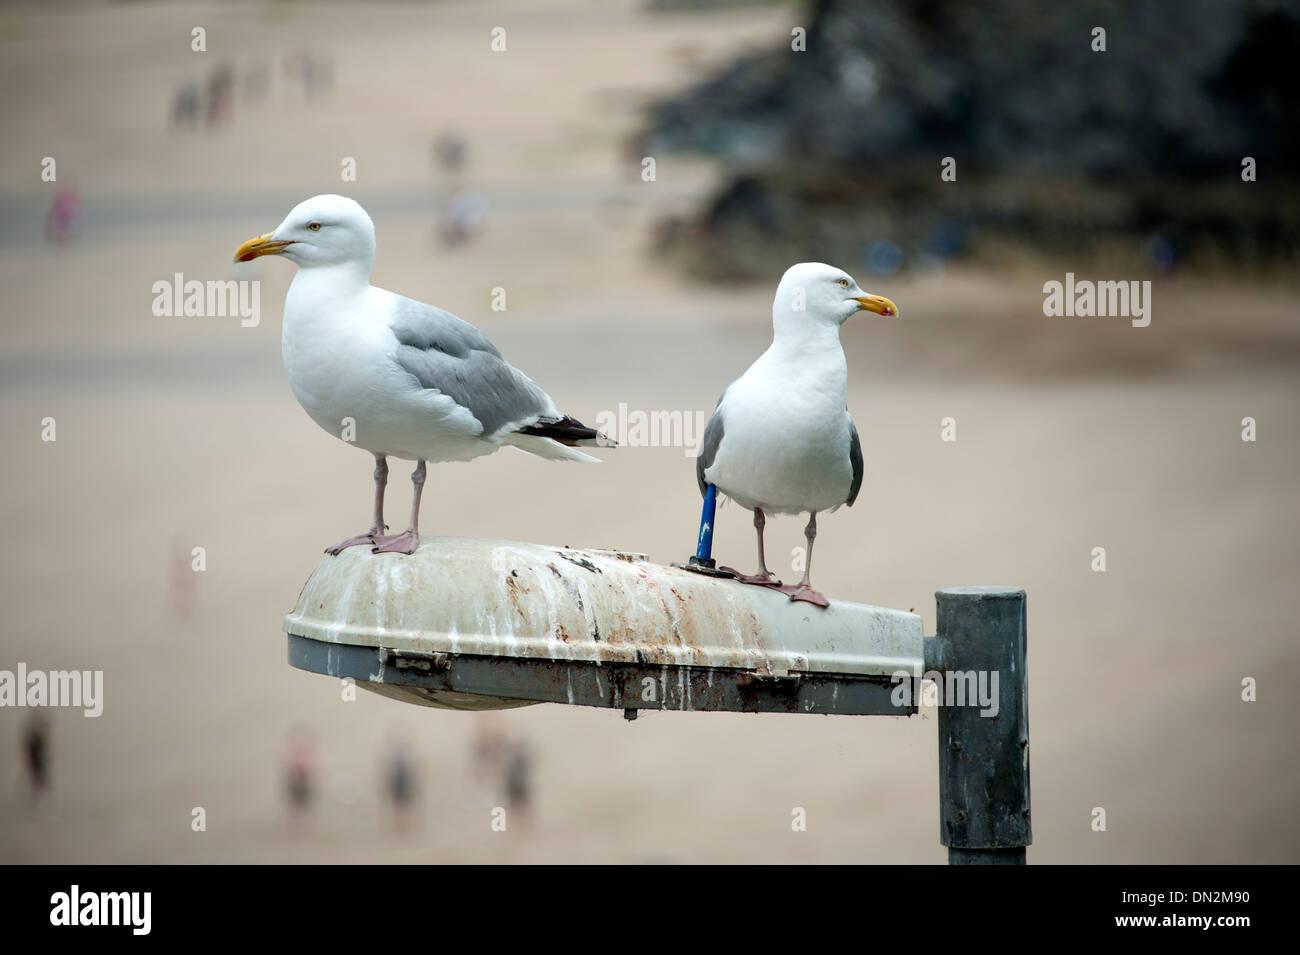 Seagulls on street lamp poo mess dirty soiled - Stock Image